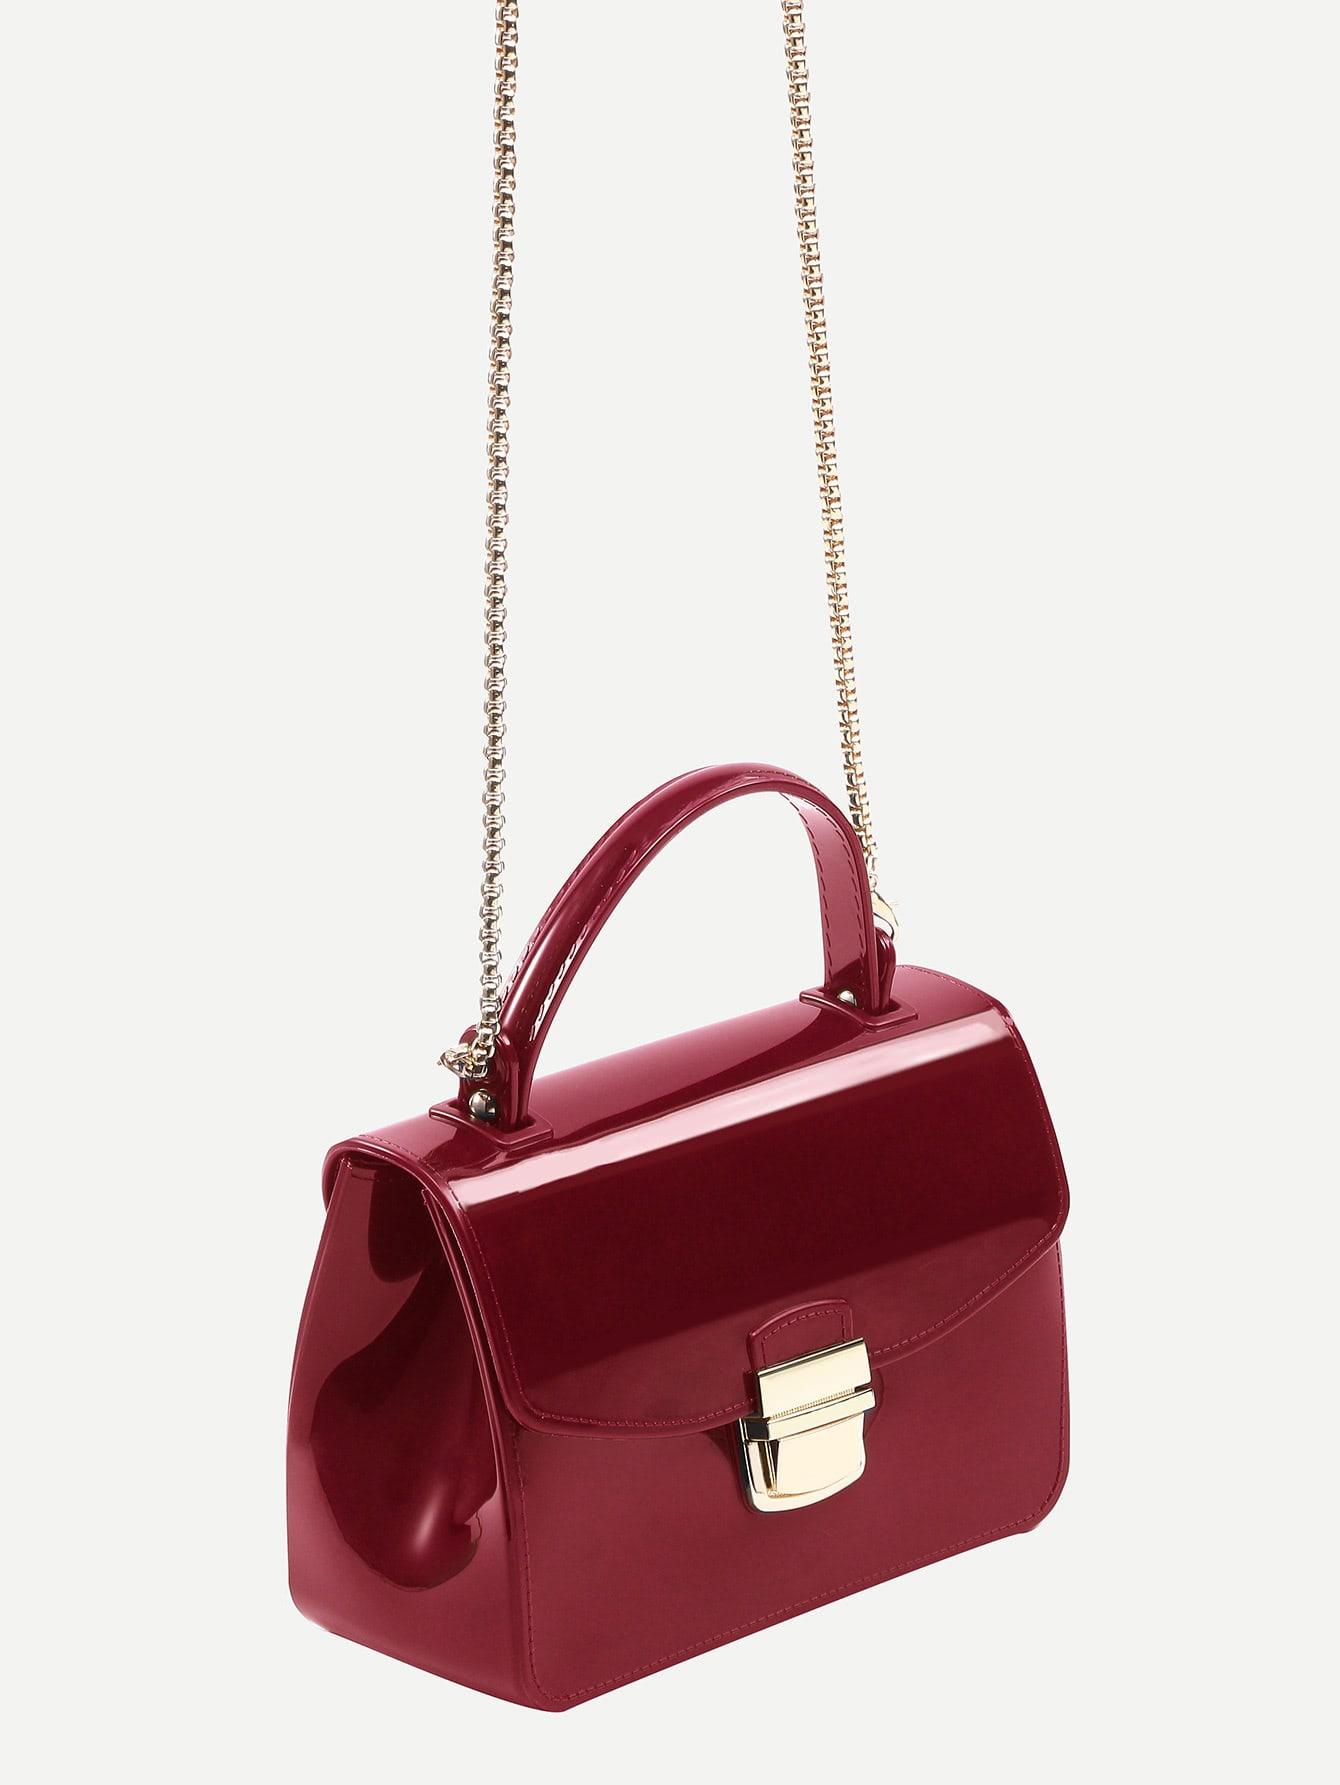 sac cartable main avec fermoir verrou rouge french romwe. Black Bedroom Furniture Sets. Home Design Ideas